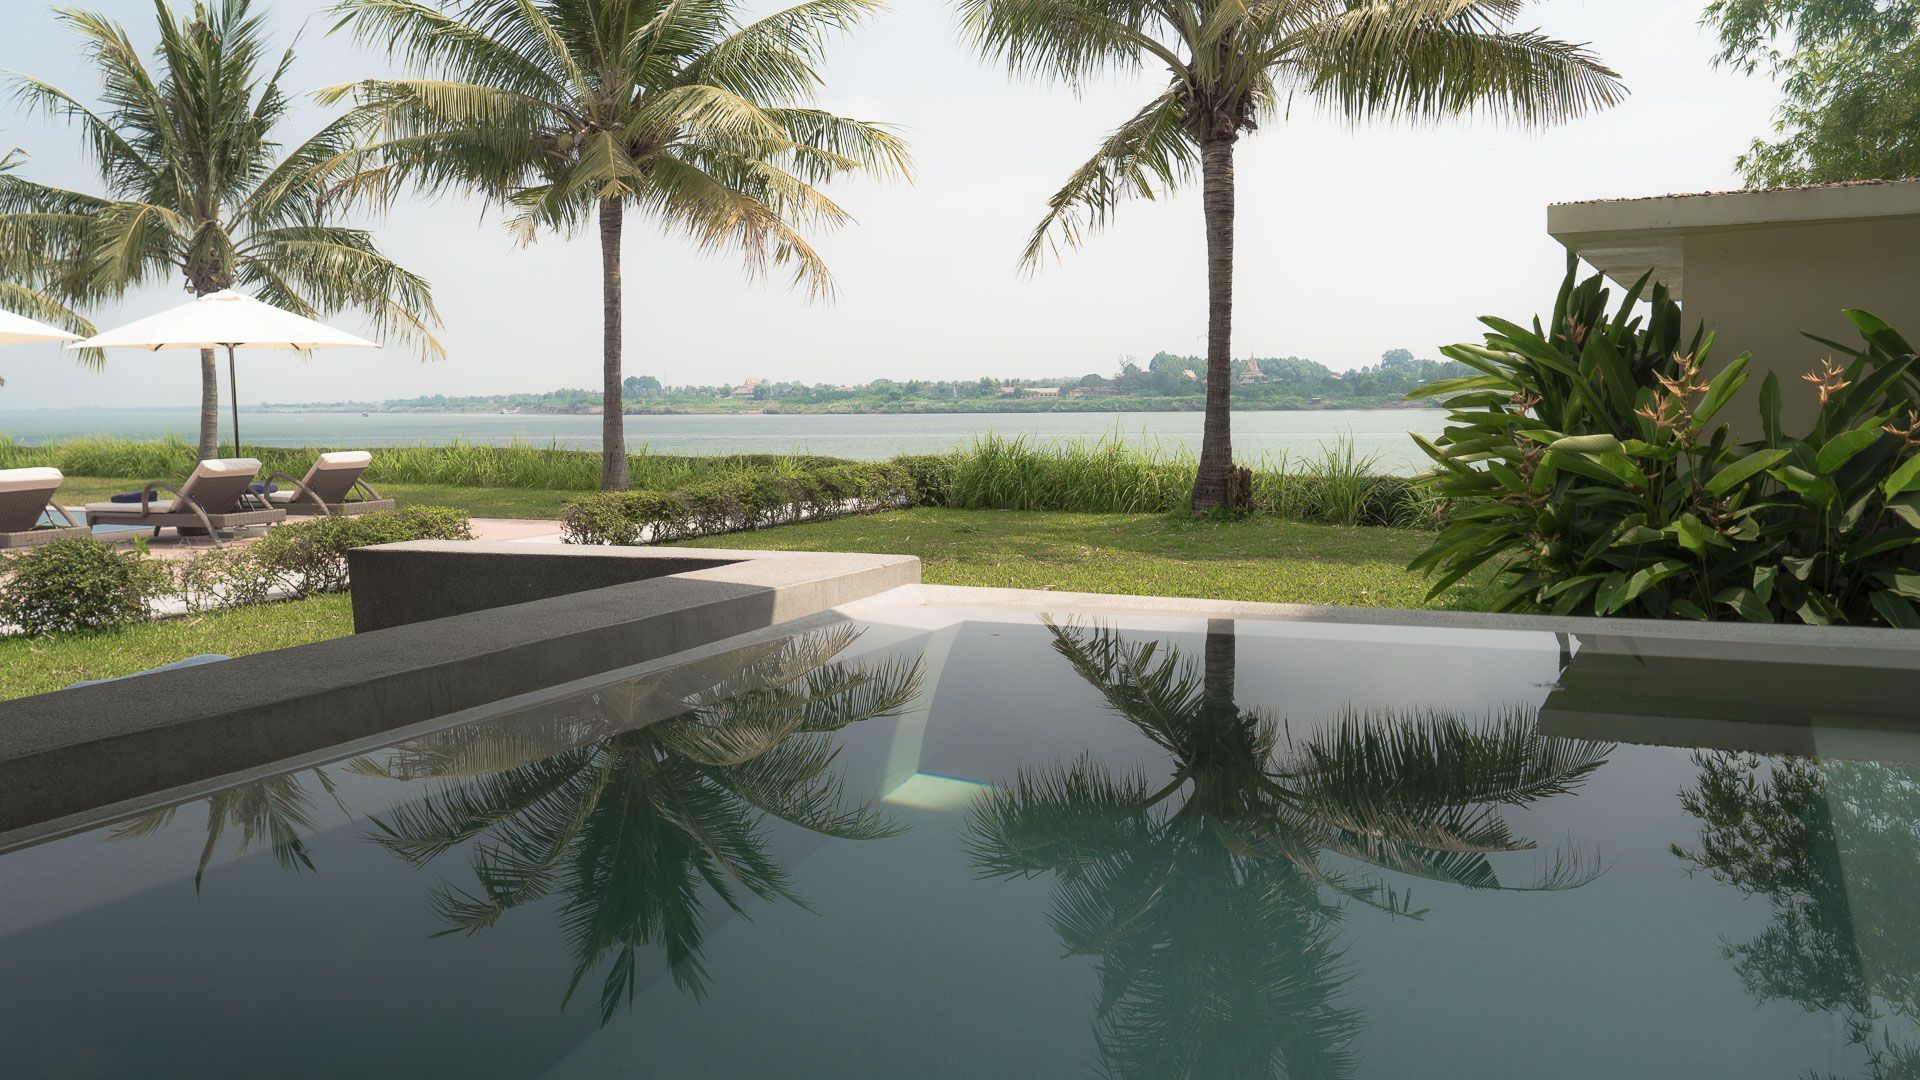 Lesvoyageuses-voyage-Phnom-Penh-cambodge-hotel-the-bale-experience-31